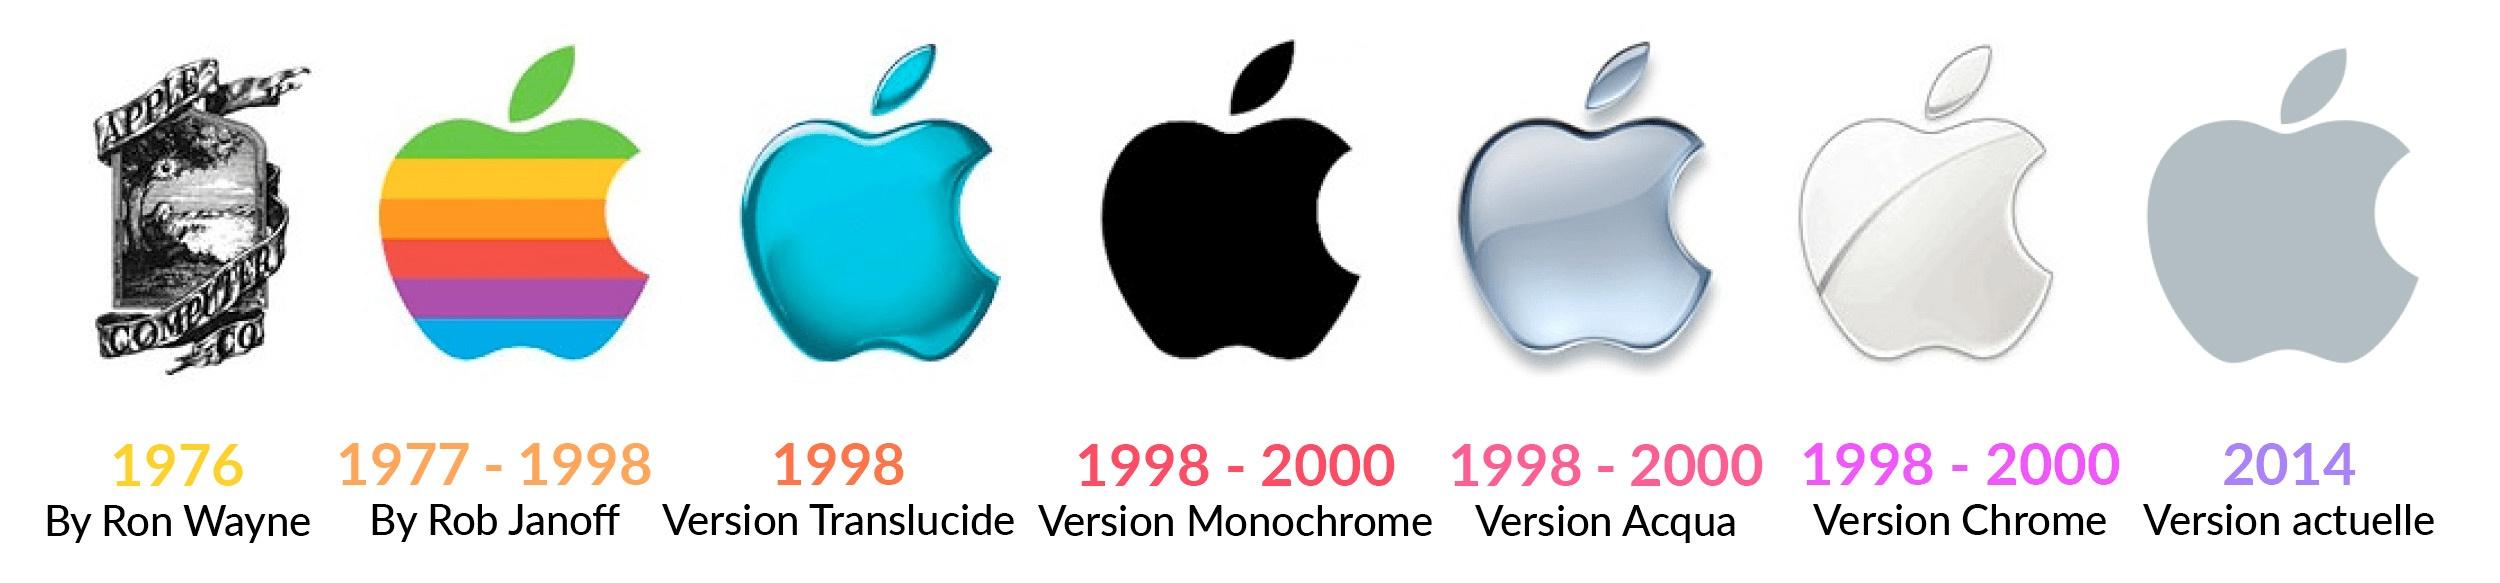 evolution charte graphique logo apple